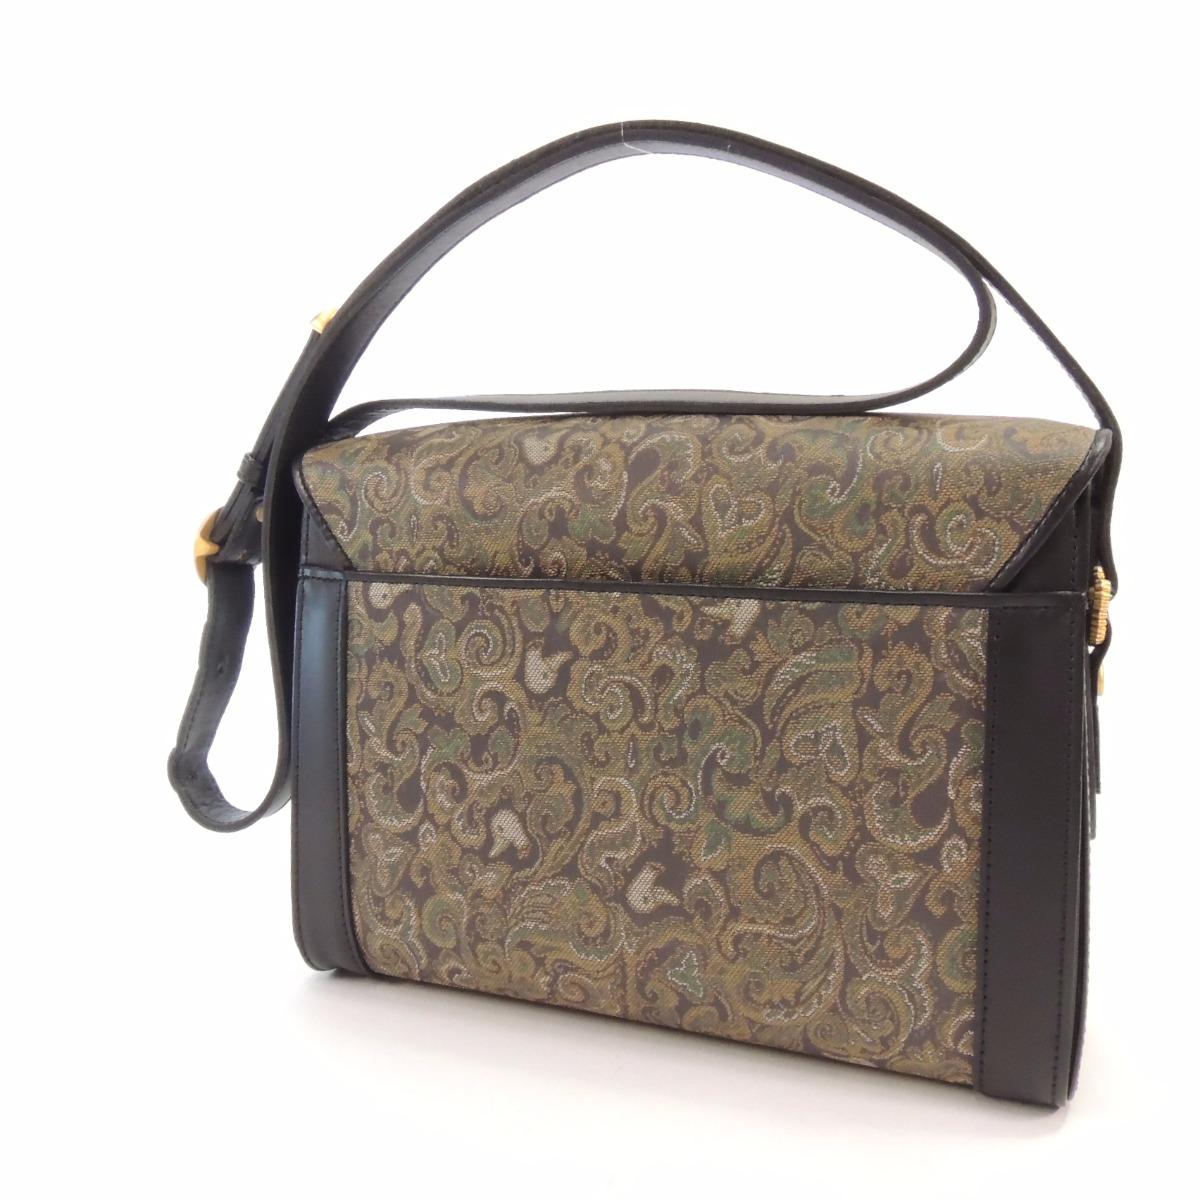 Gentleman Duck佩斯利鸭子花纹挎包表面涂层帆布/皮革女士